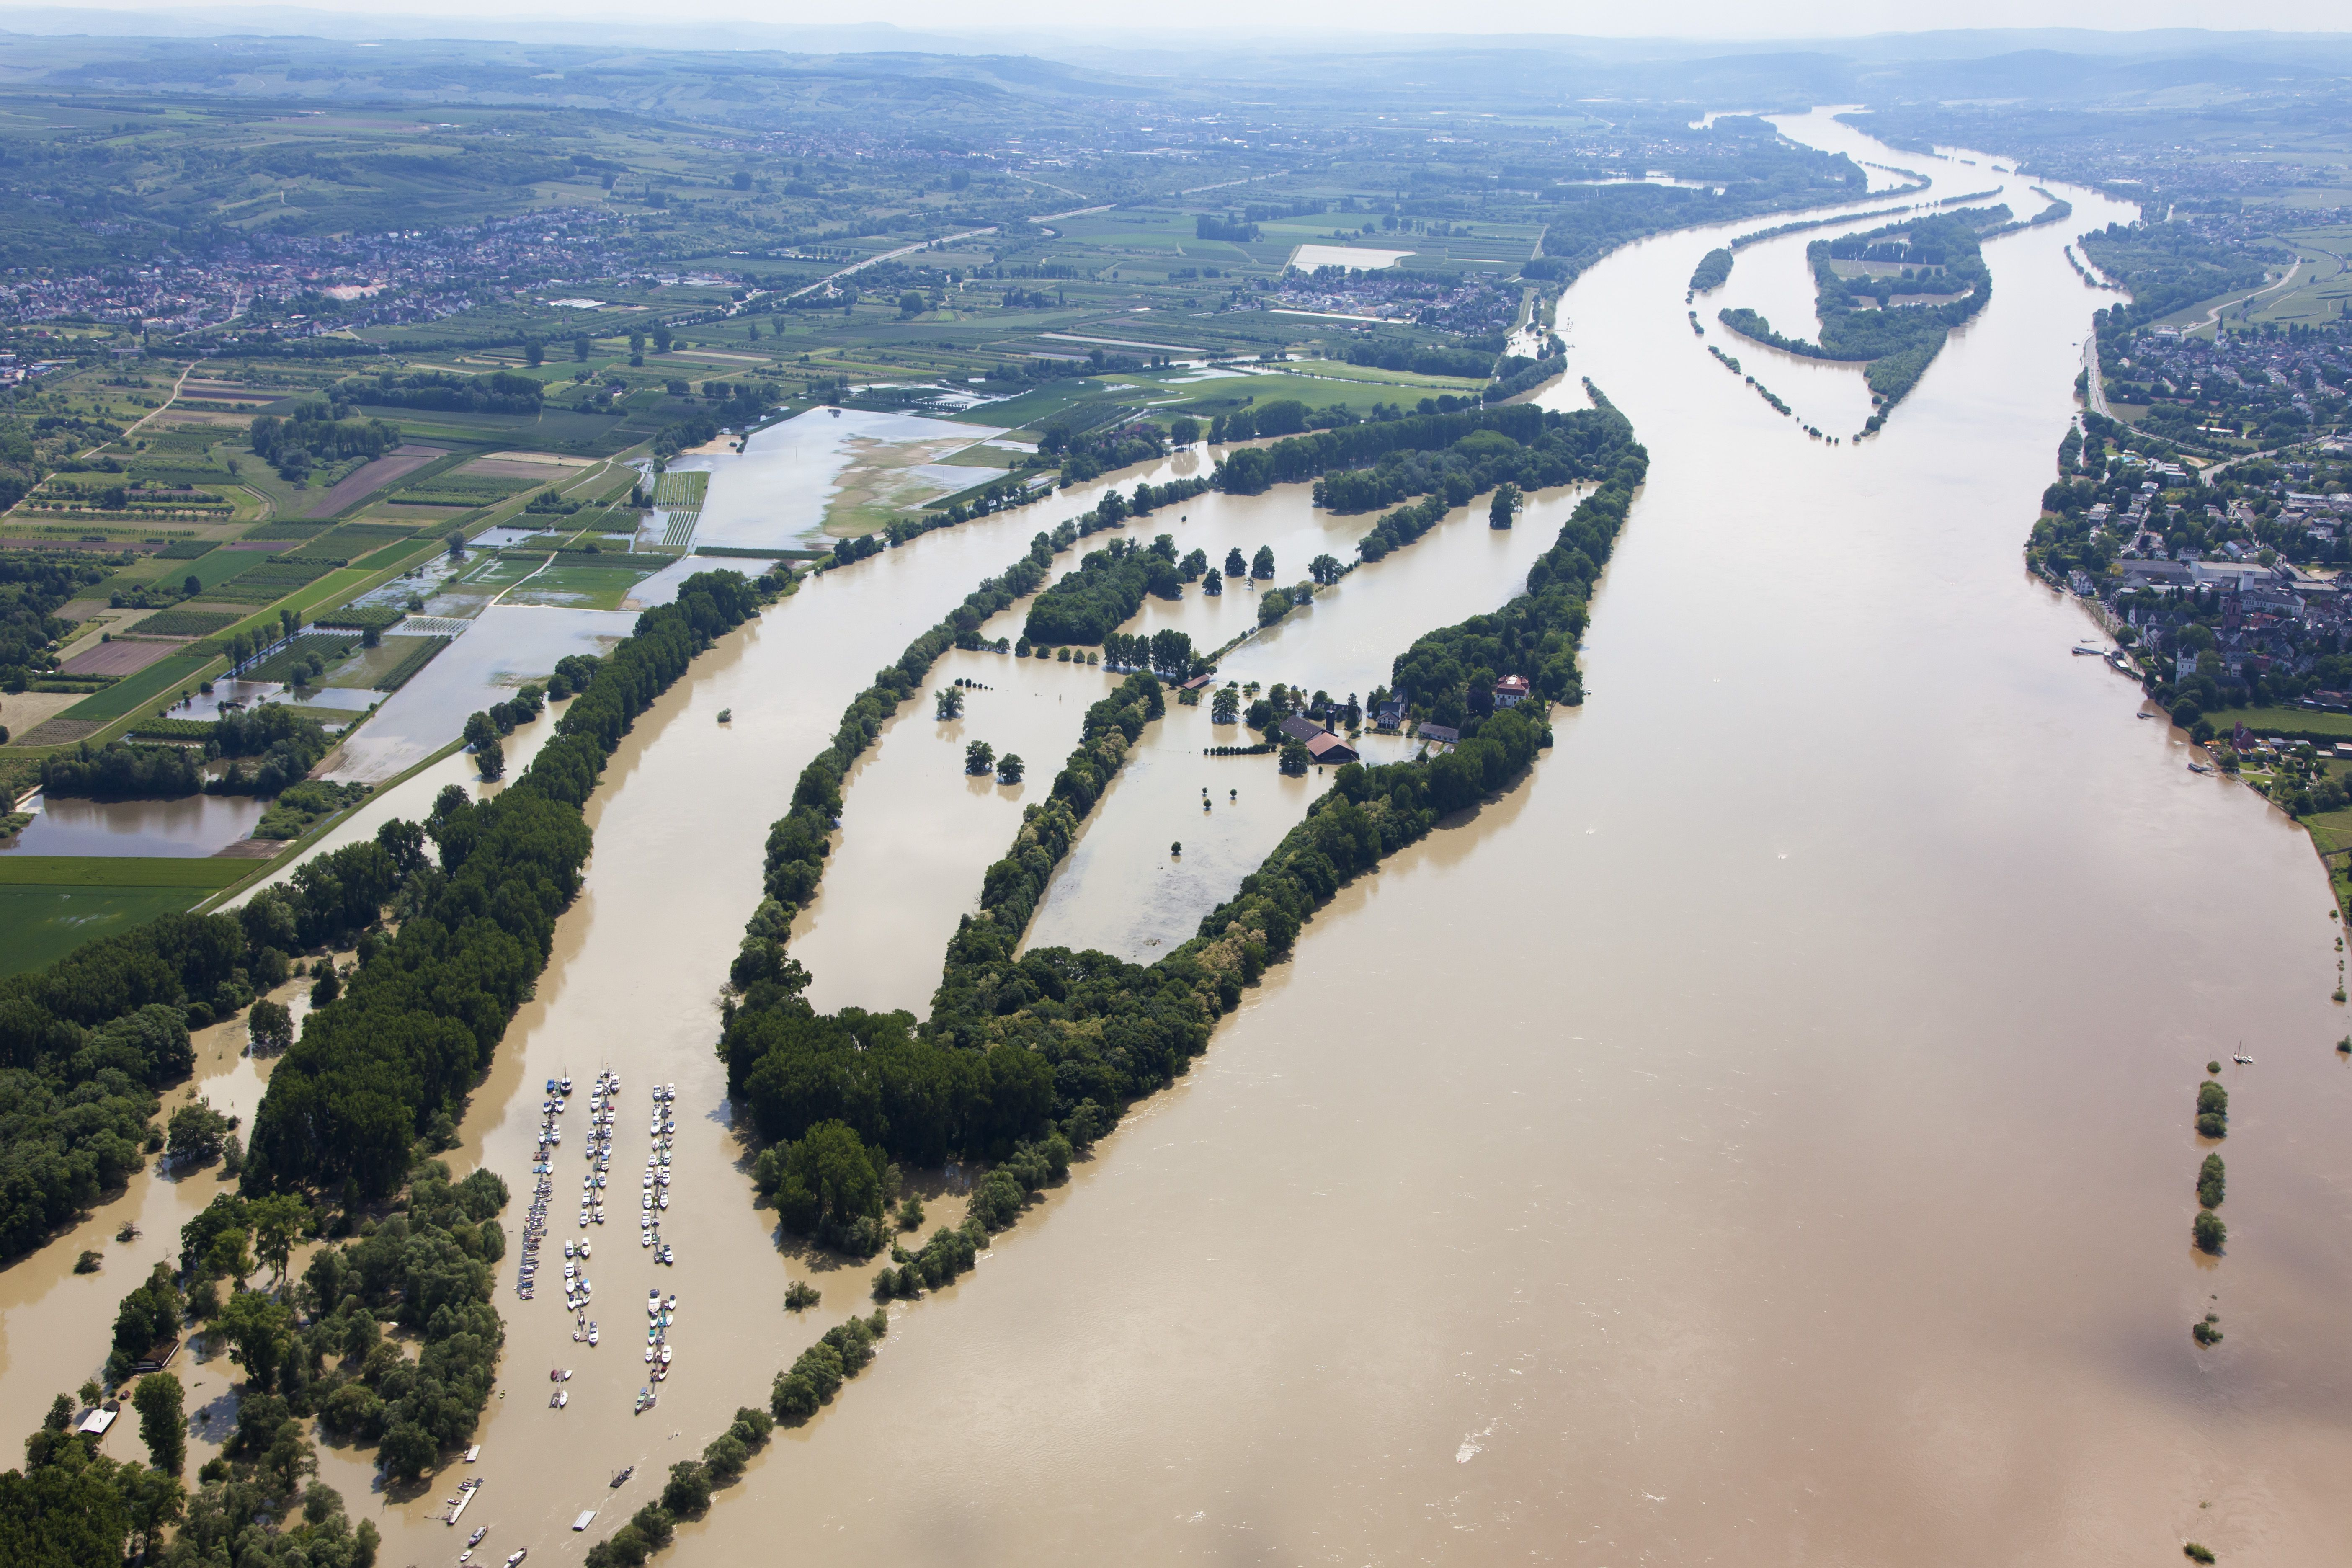 Germany, Hesse, Eltville, Flooding of River Rhine Island Koenigskling Aue, aerial photo